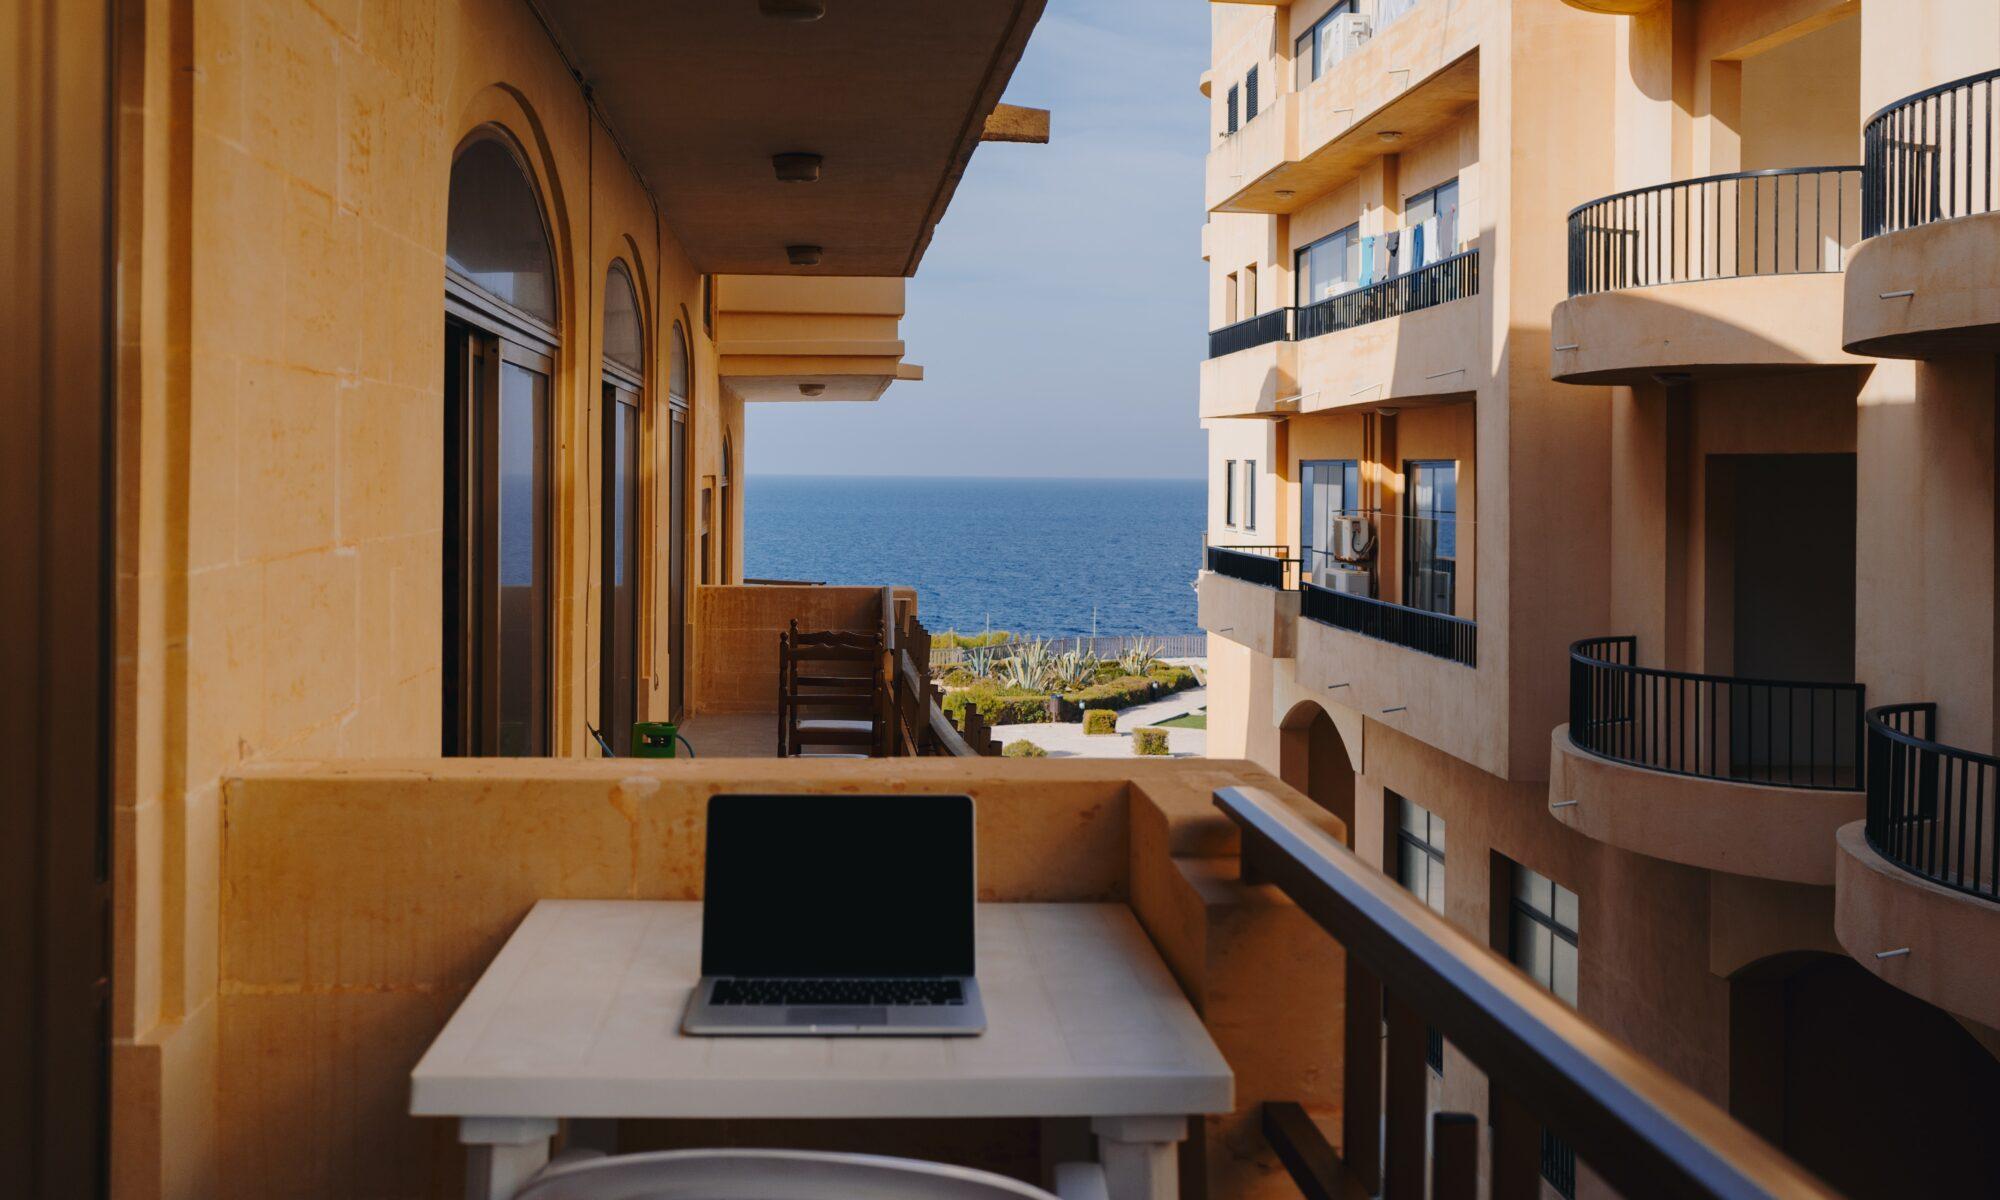 Working in Malta